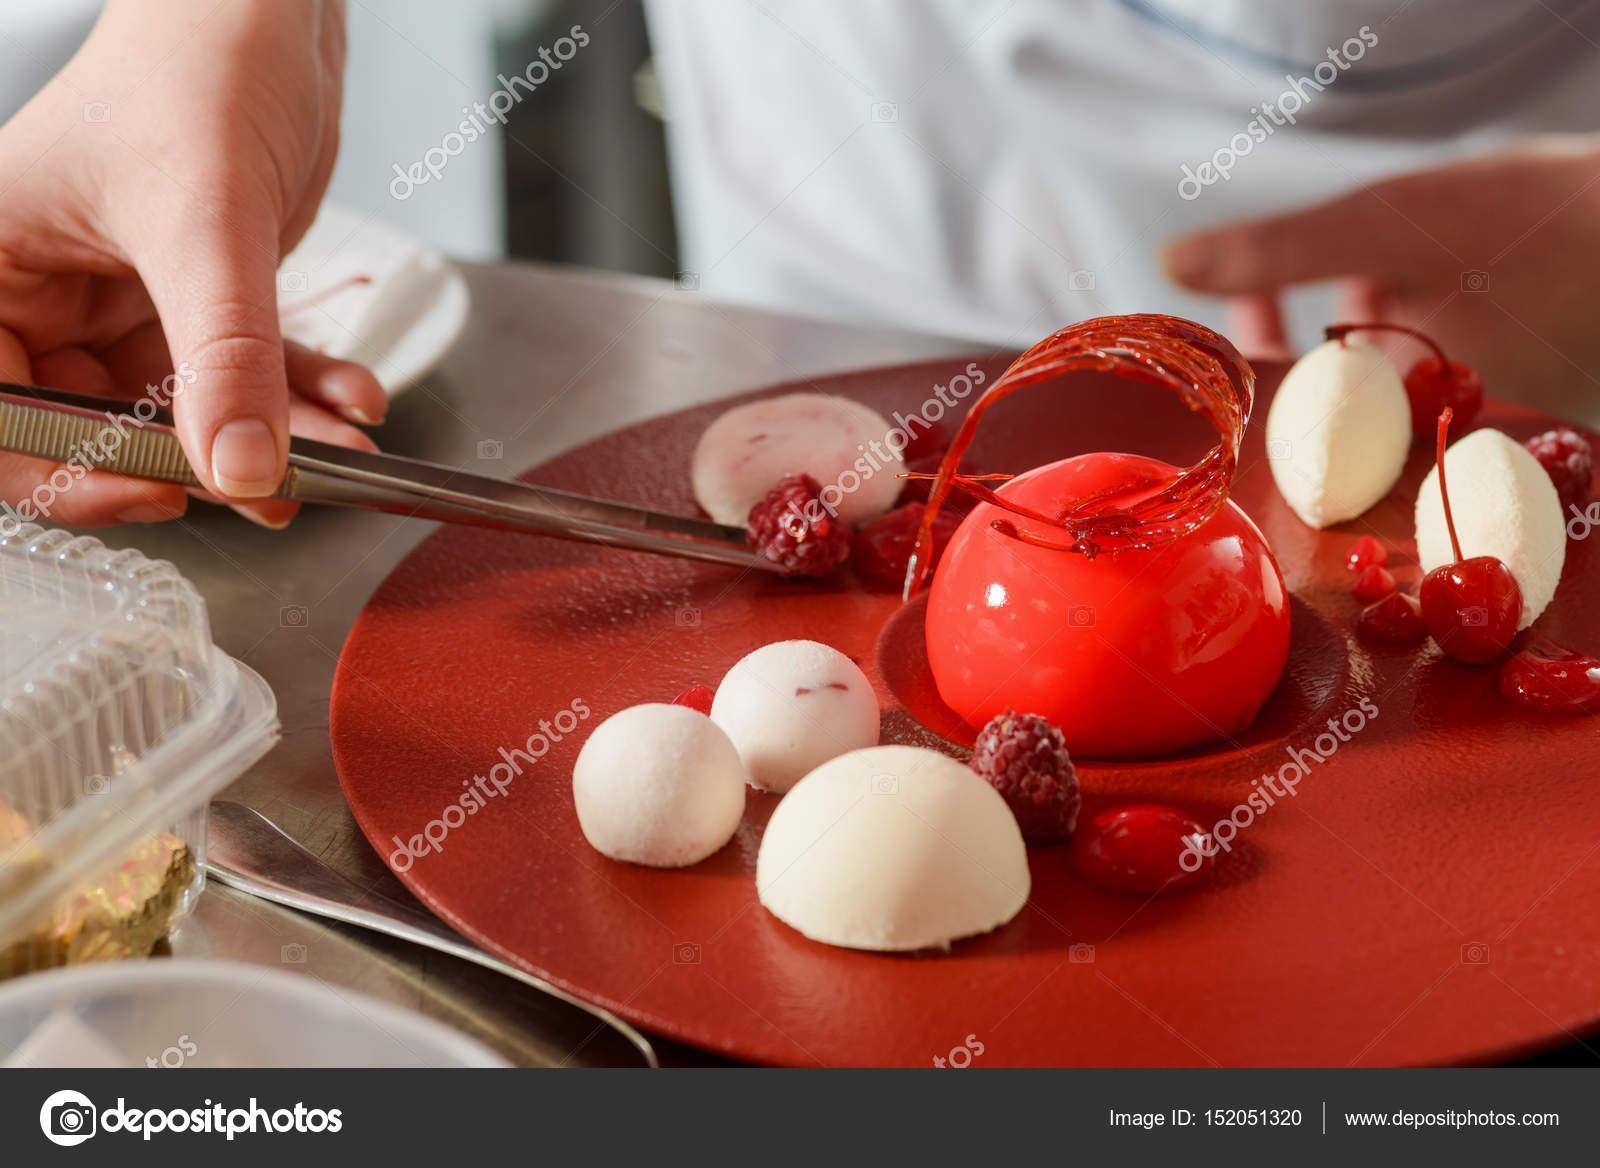 Decorating Dessert With Raspberries Stock Photo C Ygphoto 152051320